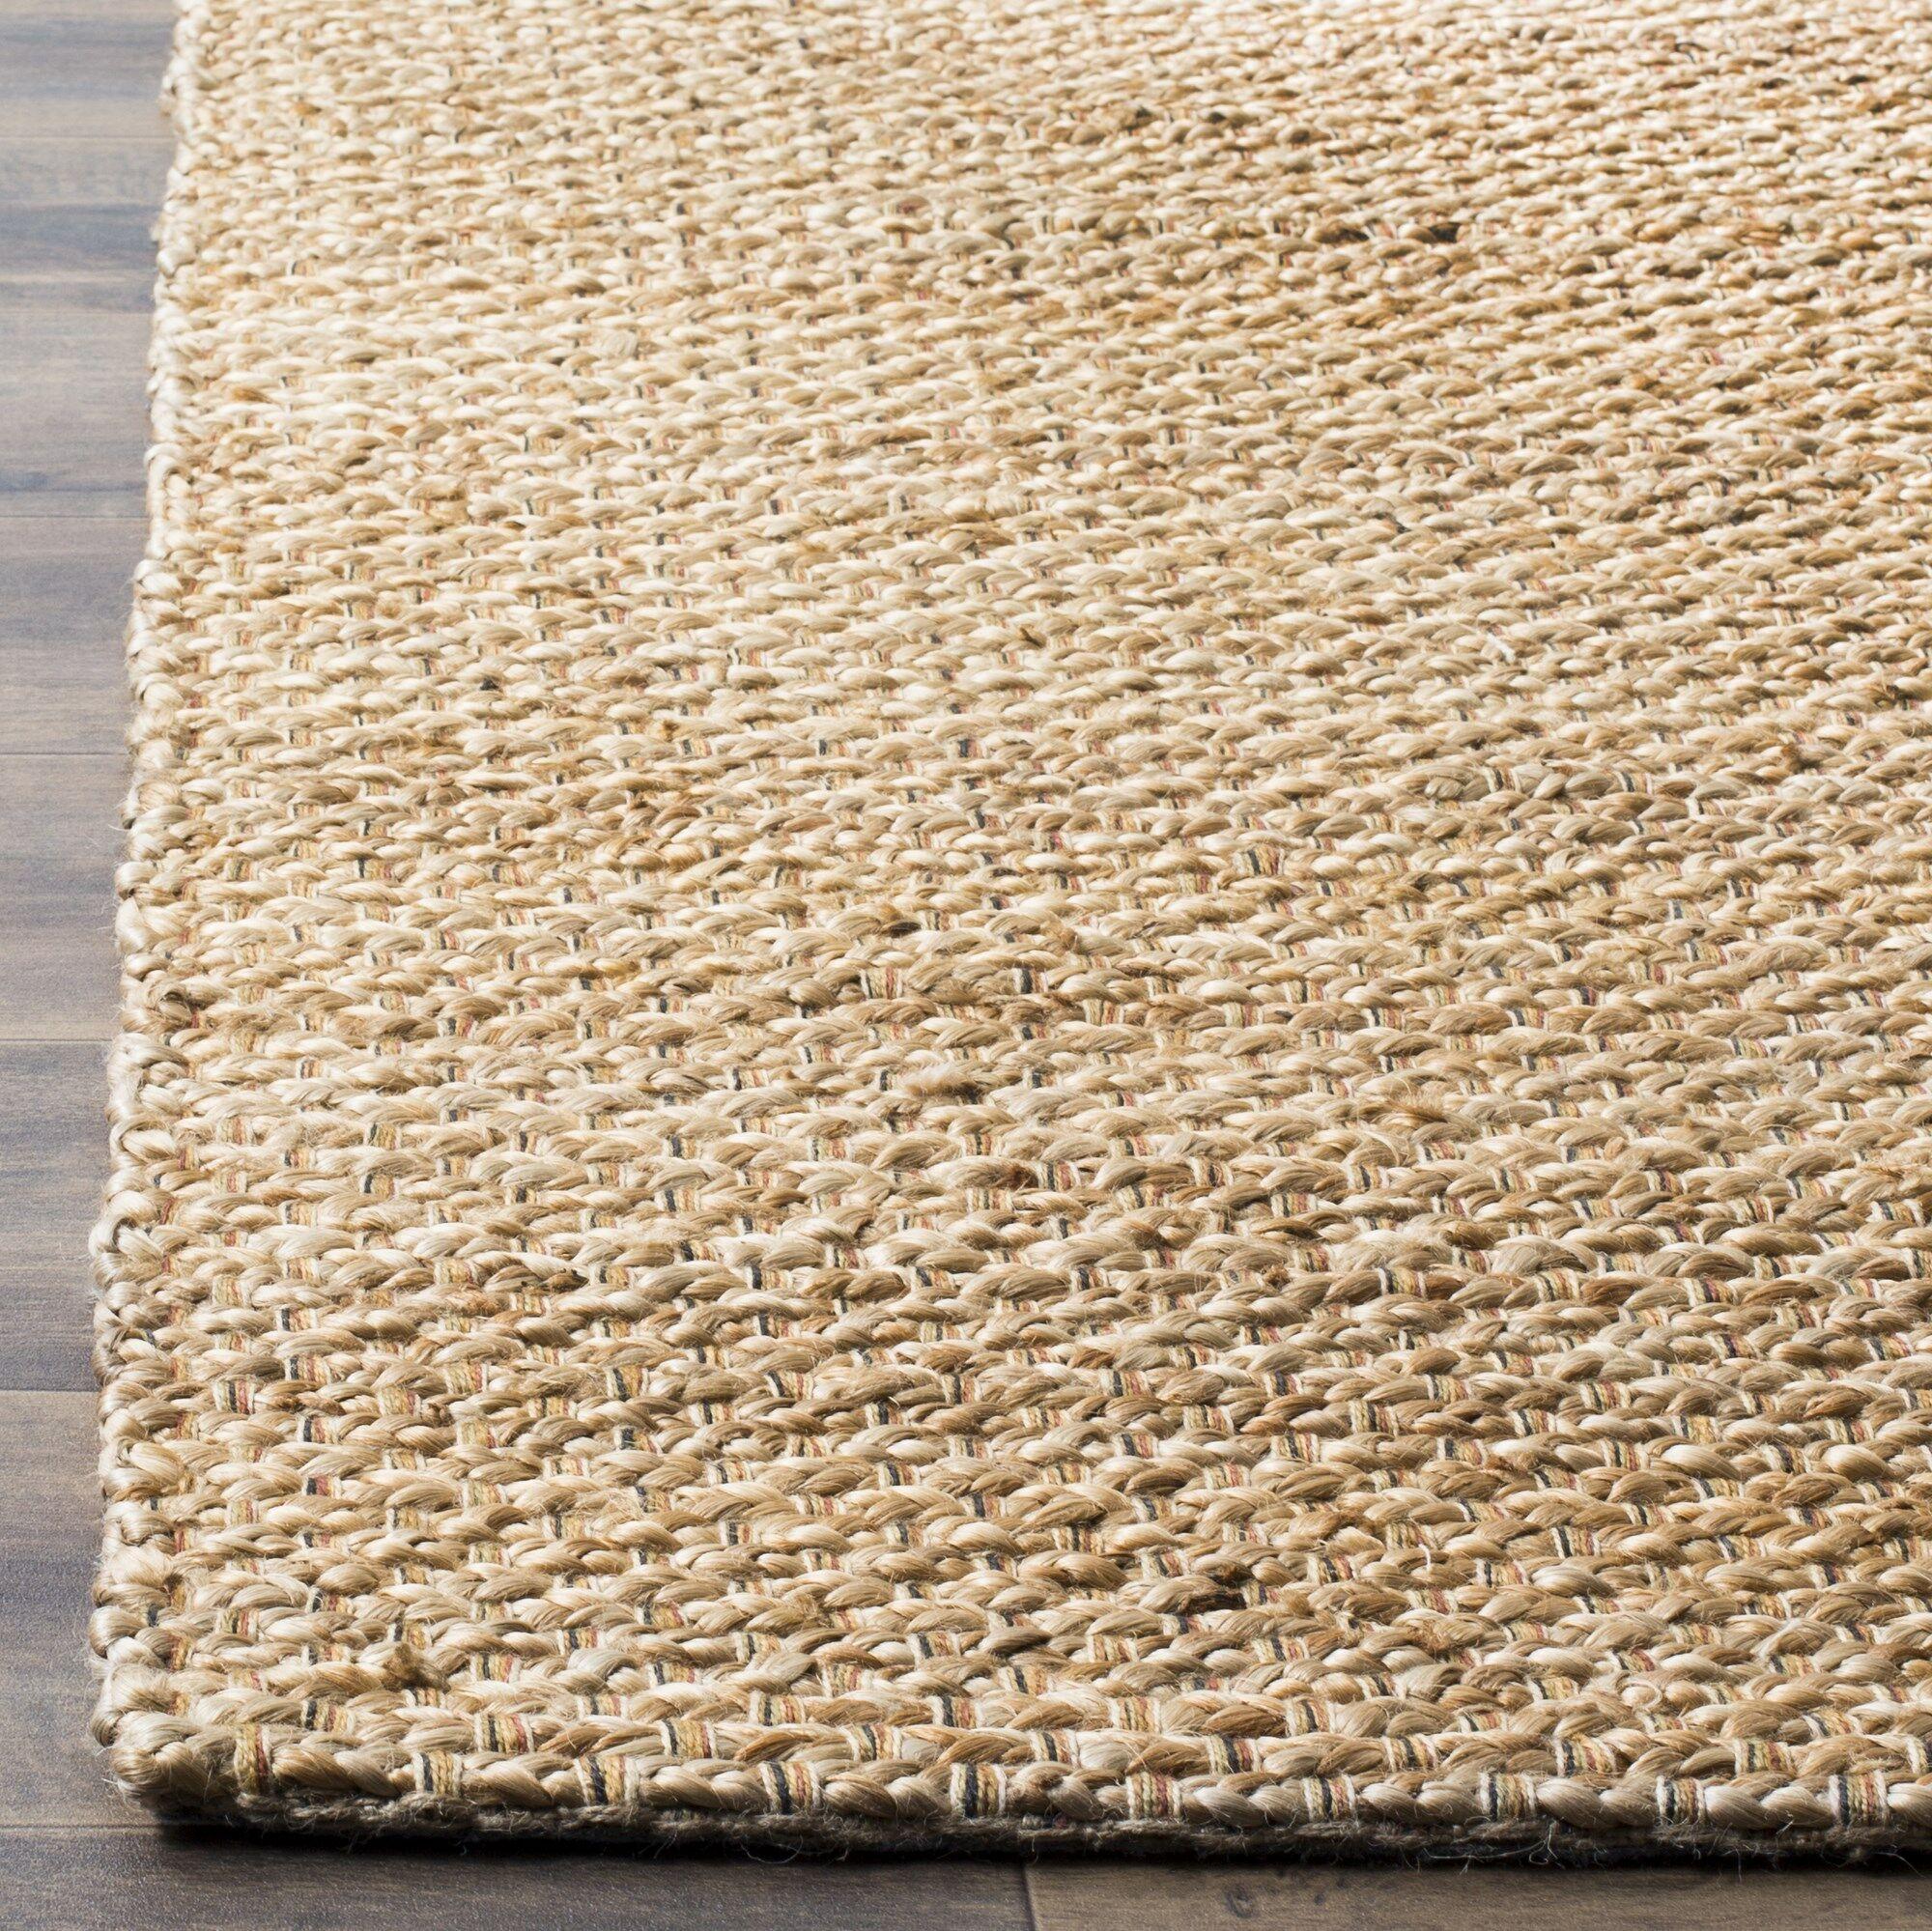 Makawee Hand-Woven Natural Area Rug Rug Size: Rectangle 6' x 9'